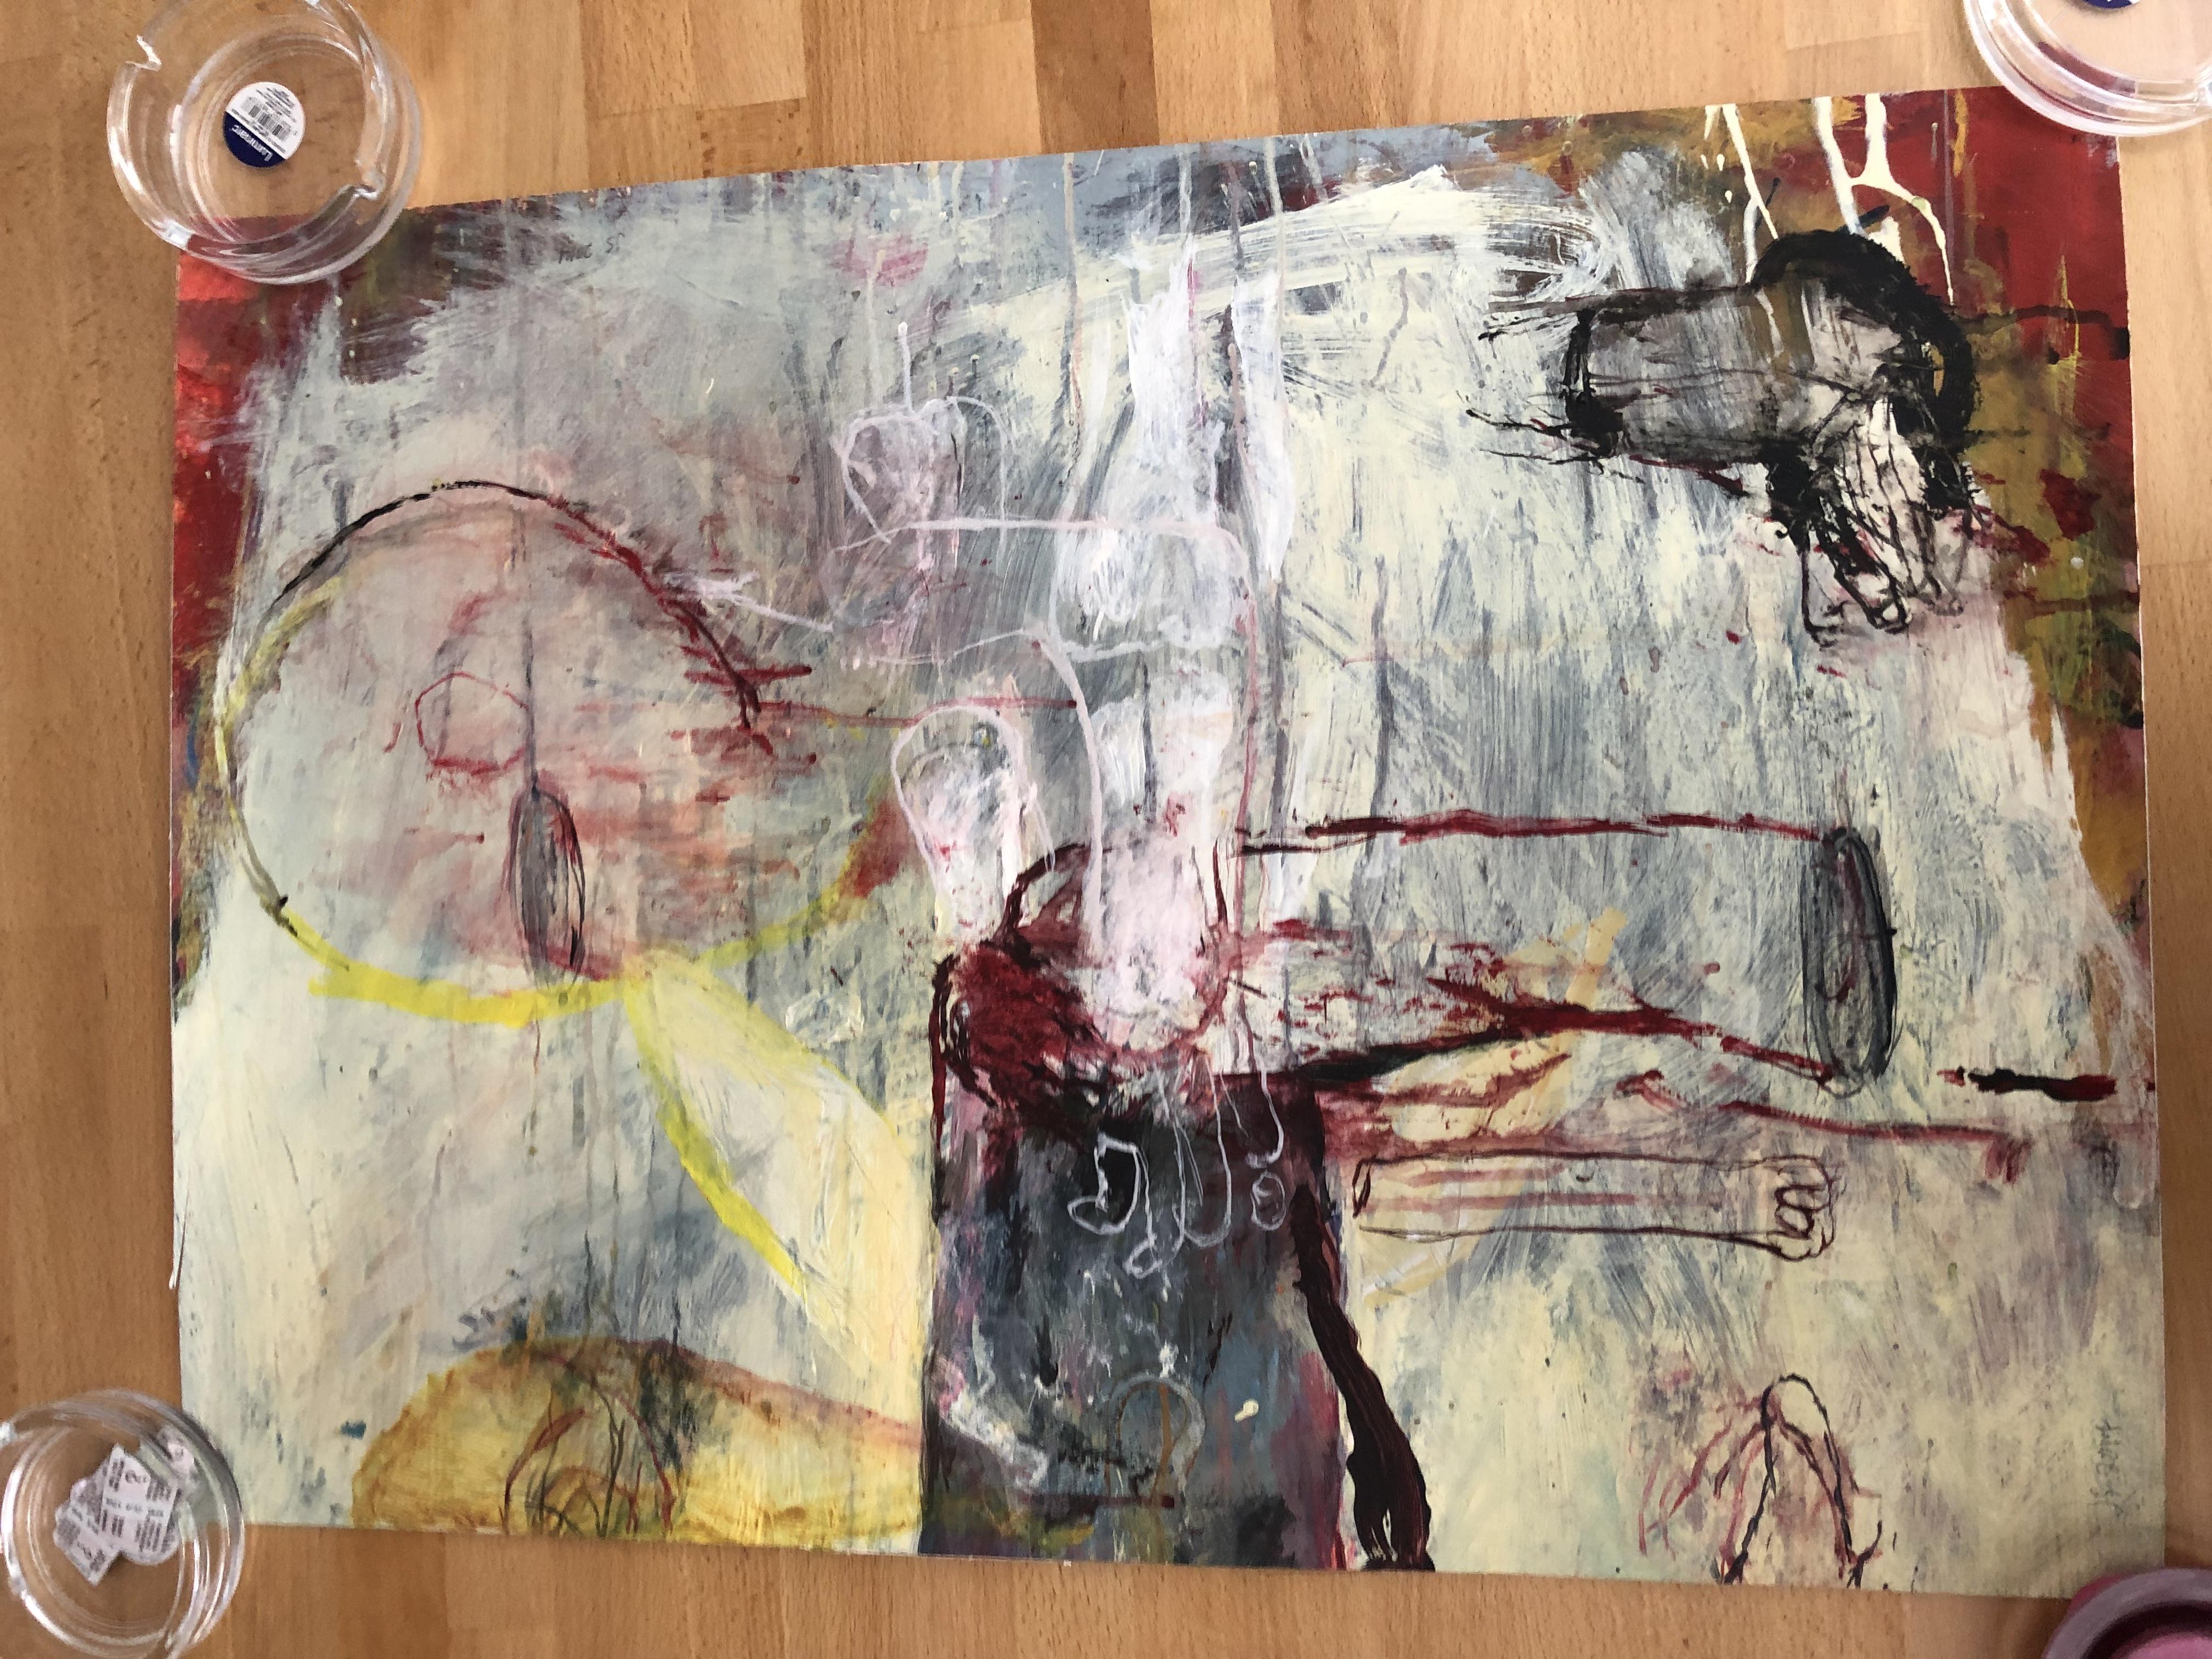 "Lot 57 - Pair of Jukka Sohonen Original Paintings ""The dog has the same journey"" & ""The flesh wall"""